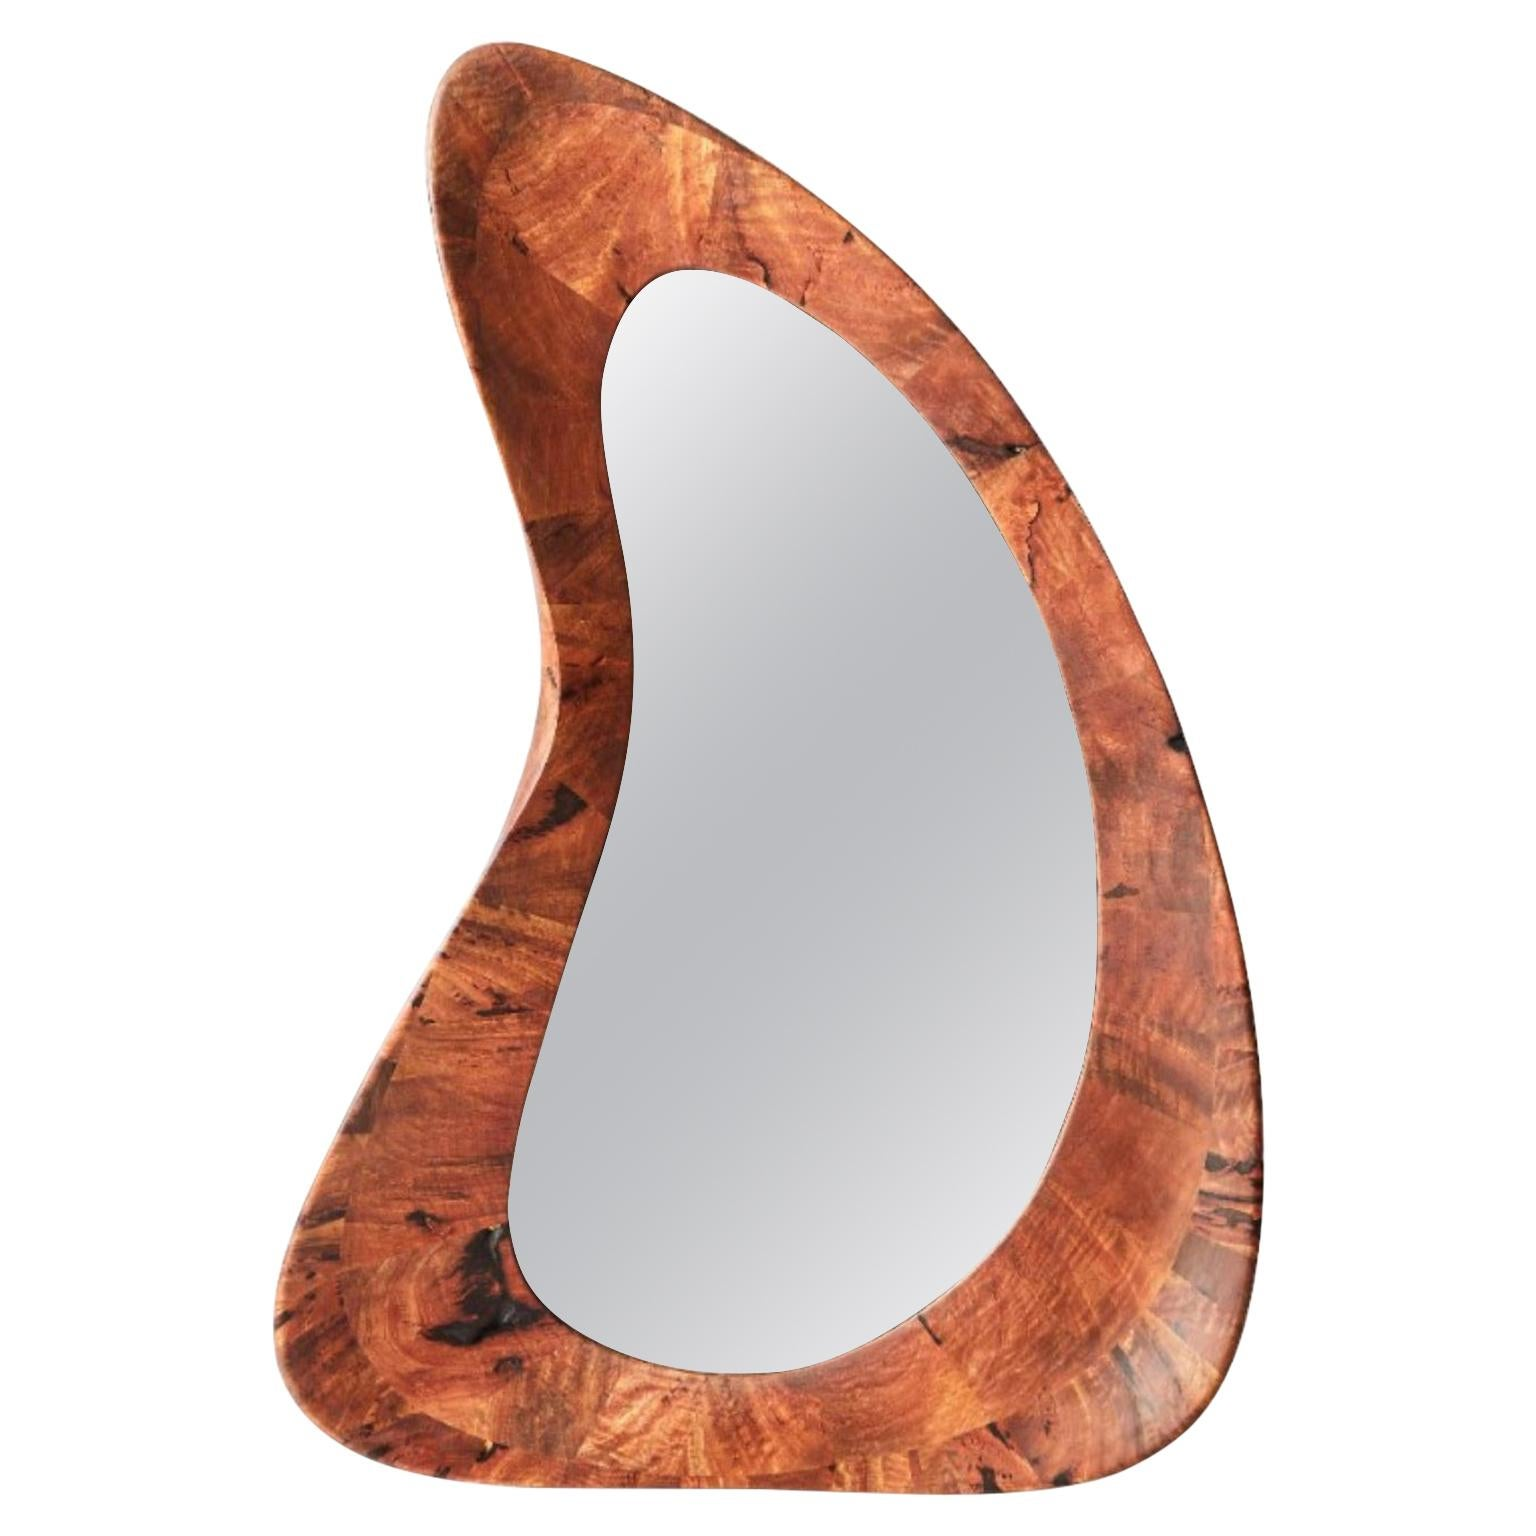 Unique Handmade Walnut Portal Mirror by Maxime Goléo